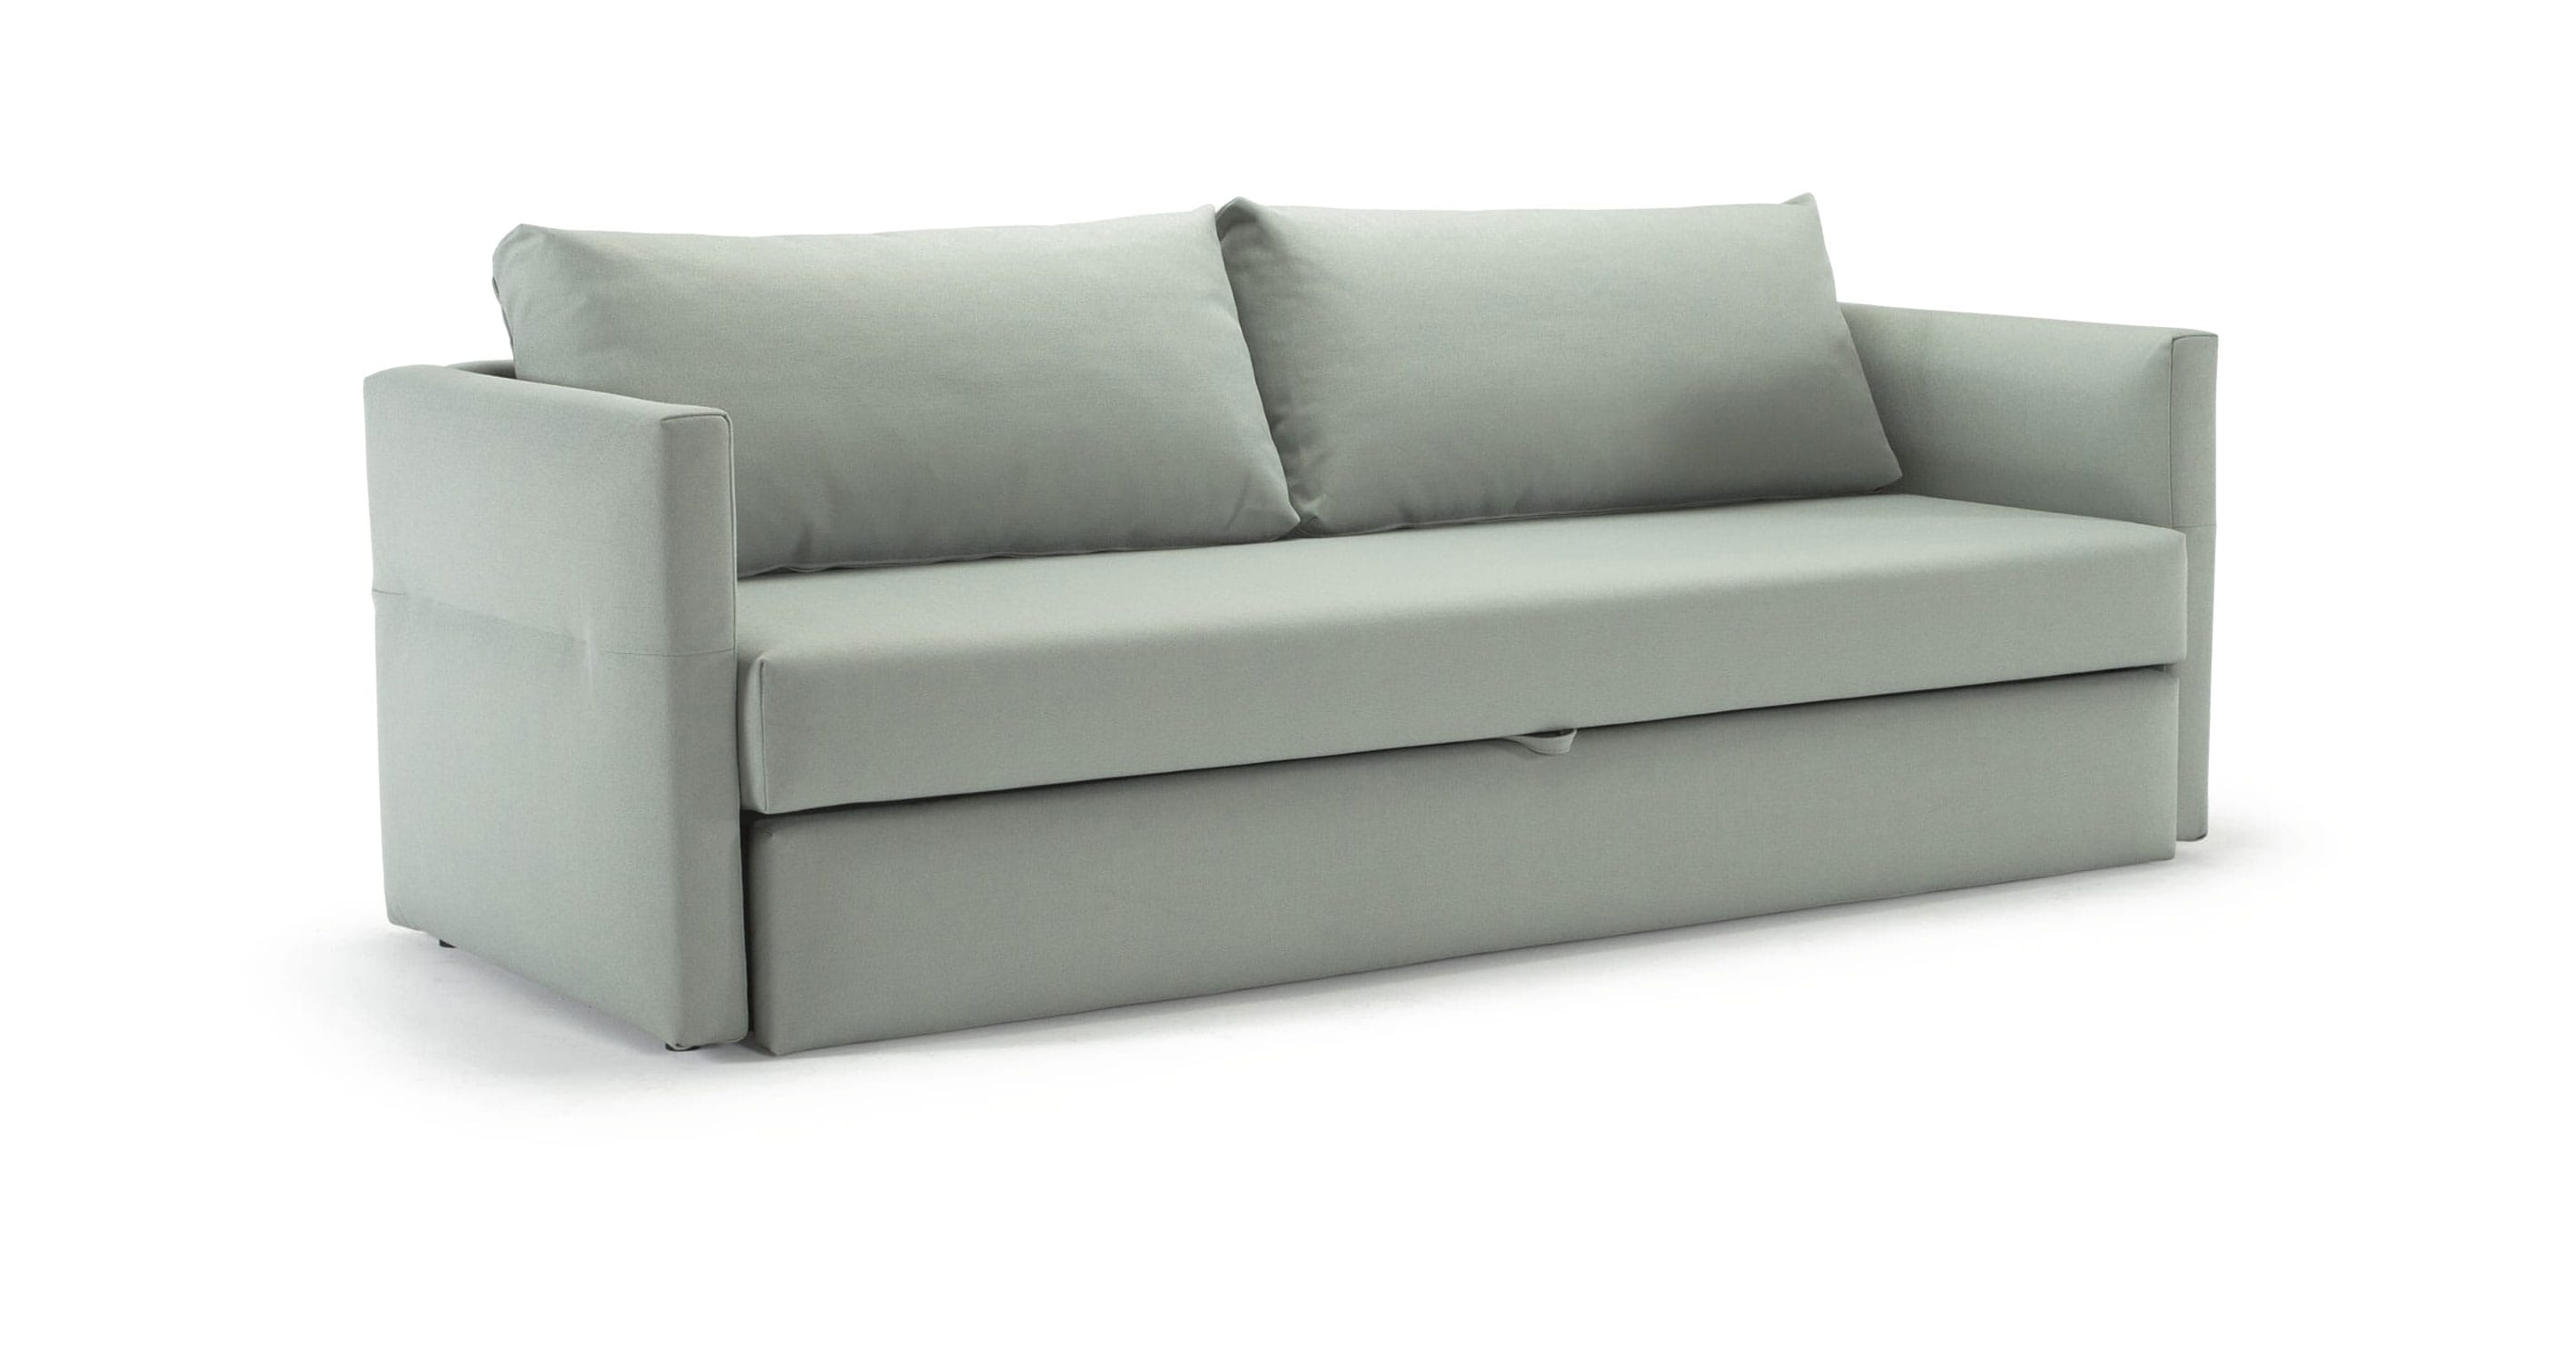 Toke Sofa Bed (Full Size) Coastal Nordic Sky By Innovation